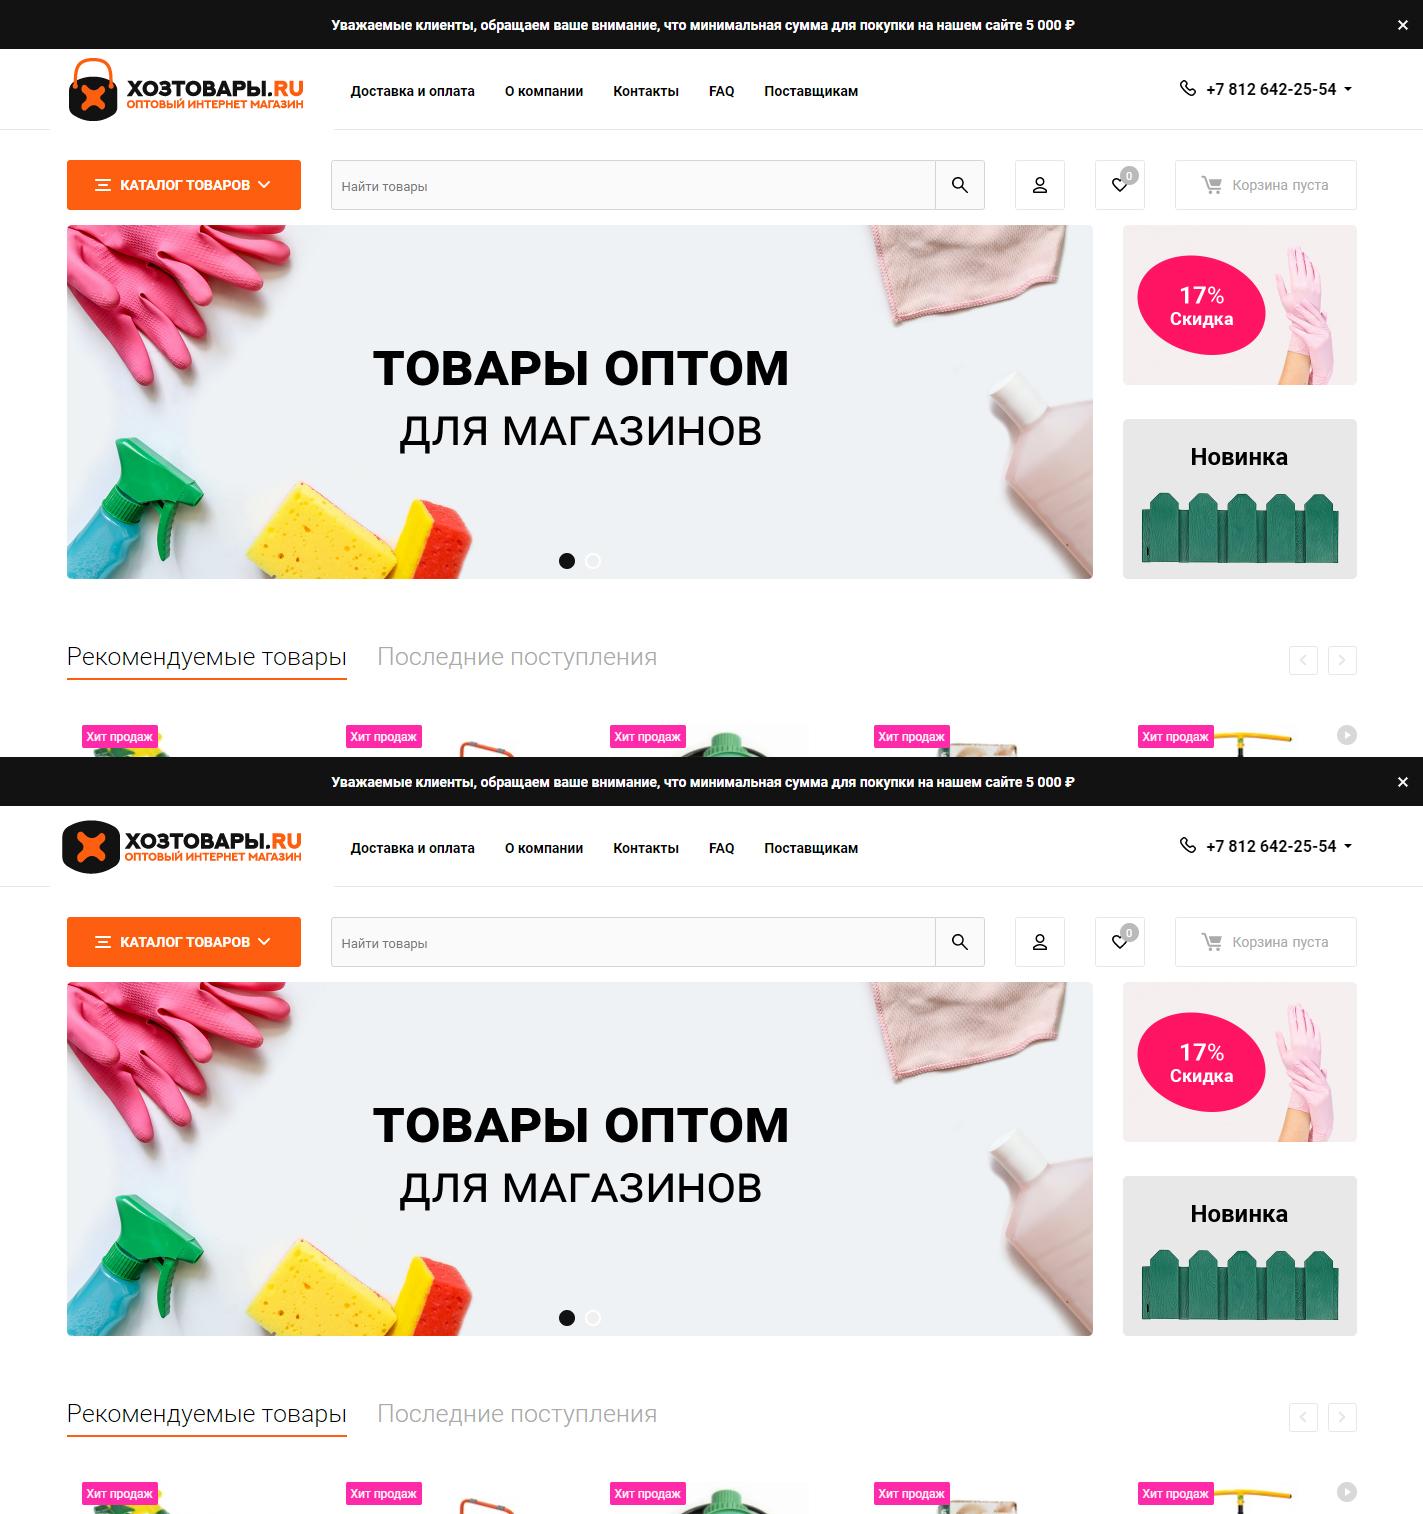 Разработка логотипа для оптового интернет-магазина «Хозтовары.ру» фото f_385606cc1eb8c581.jpg